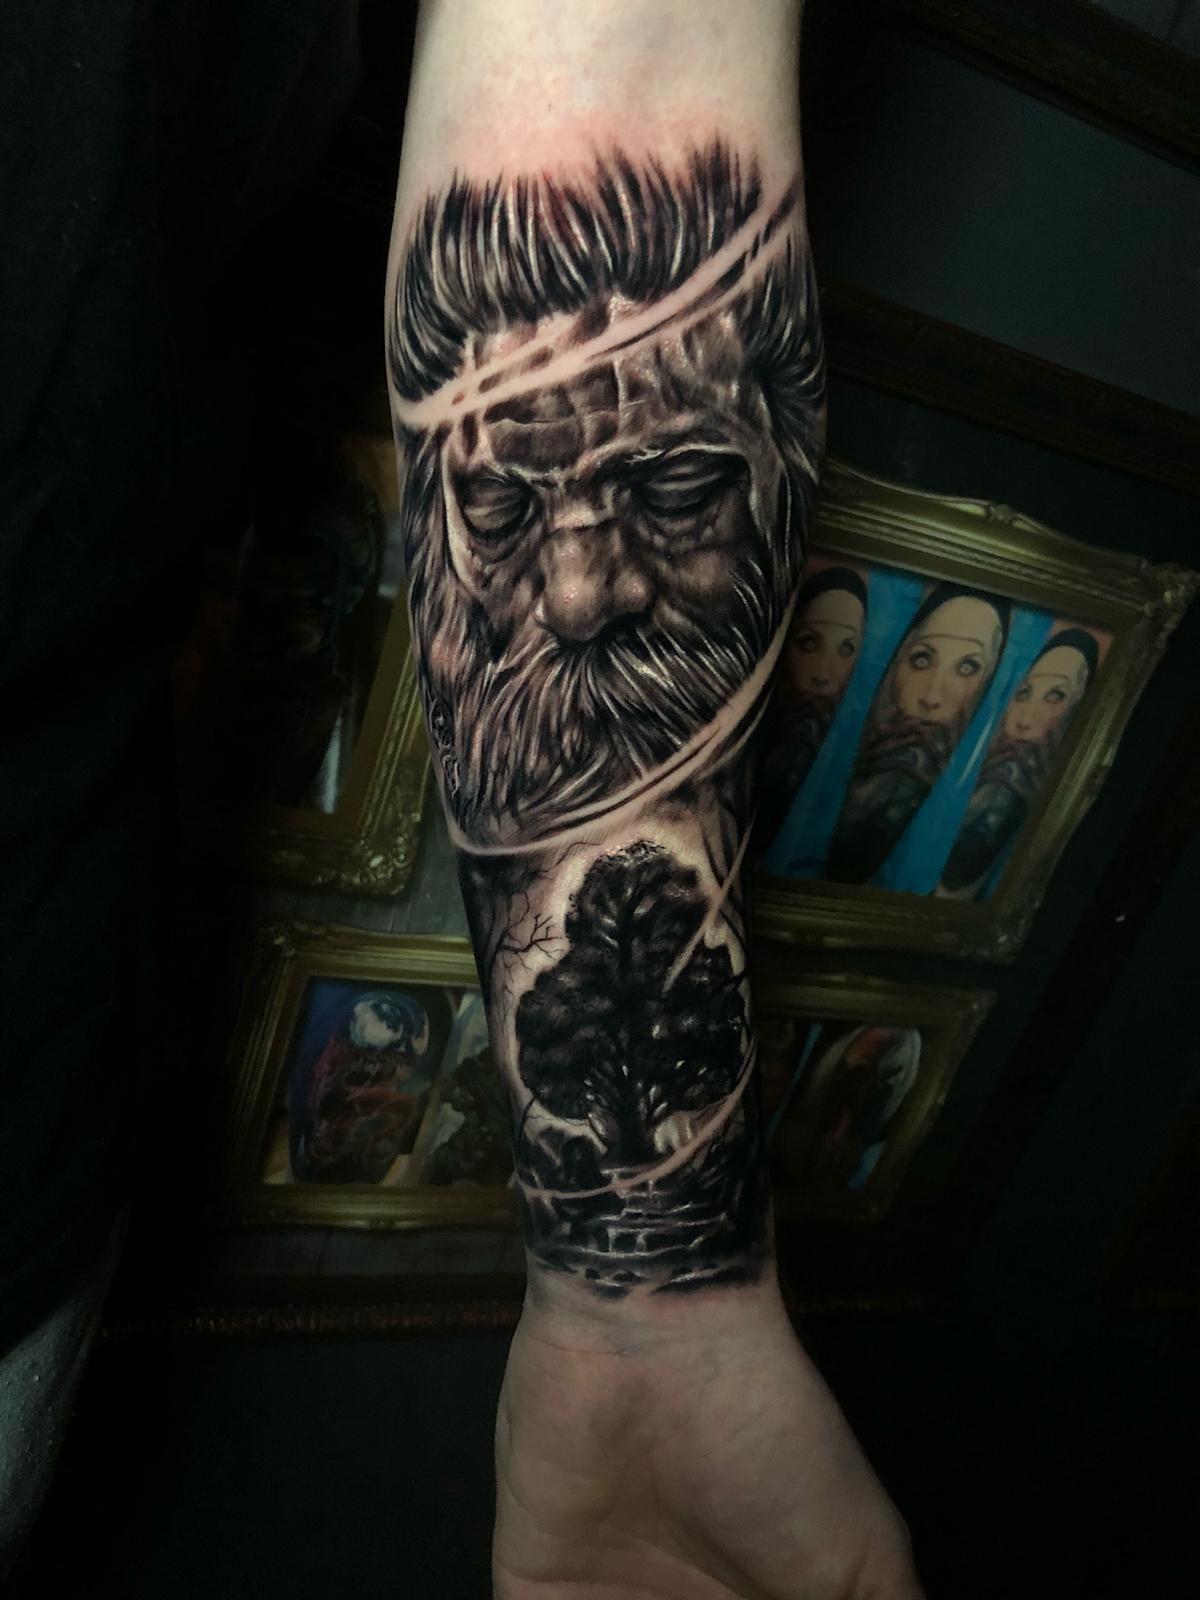 Sleeve Tattoo Holy Trinity Tattoo Trinity Tattoo Tattoo Studio